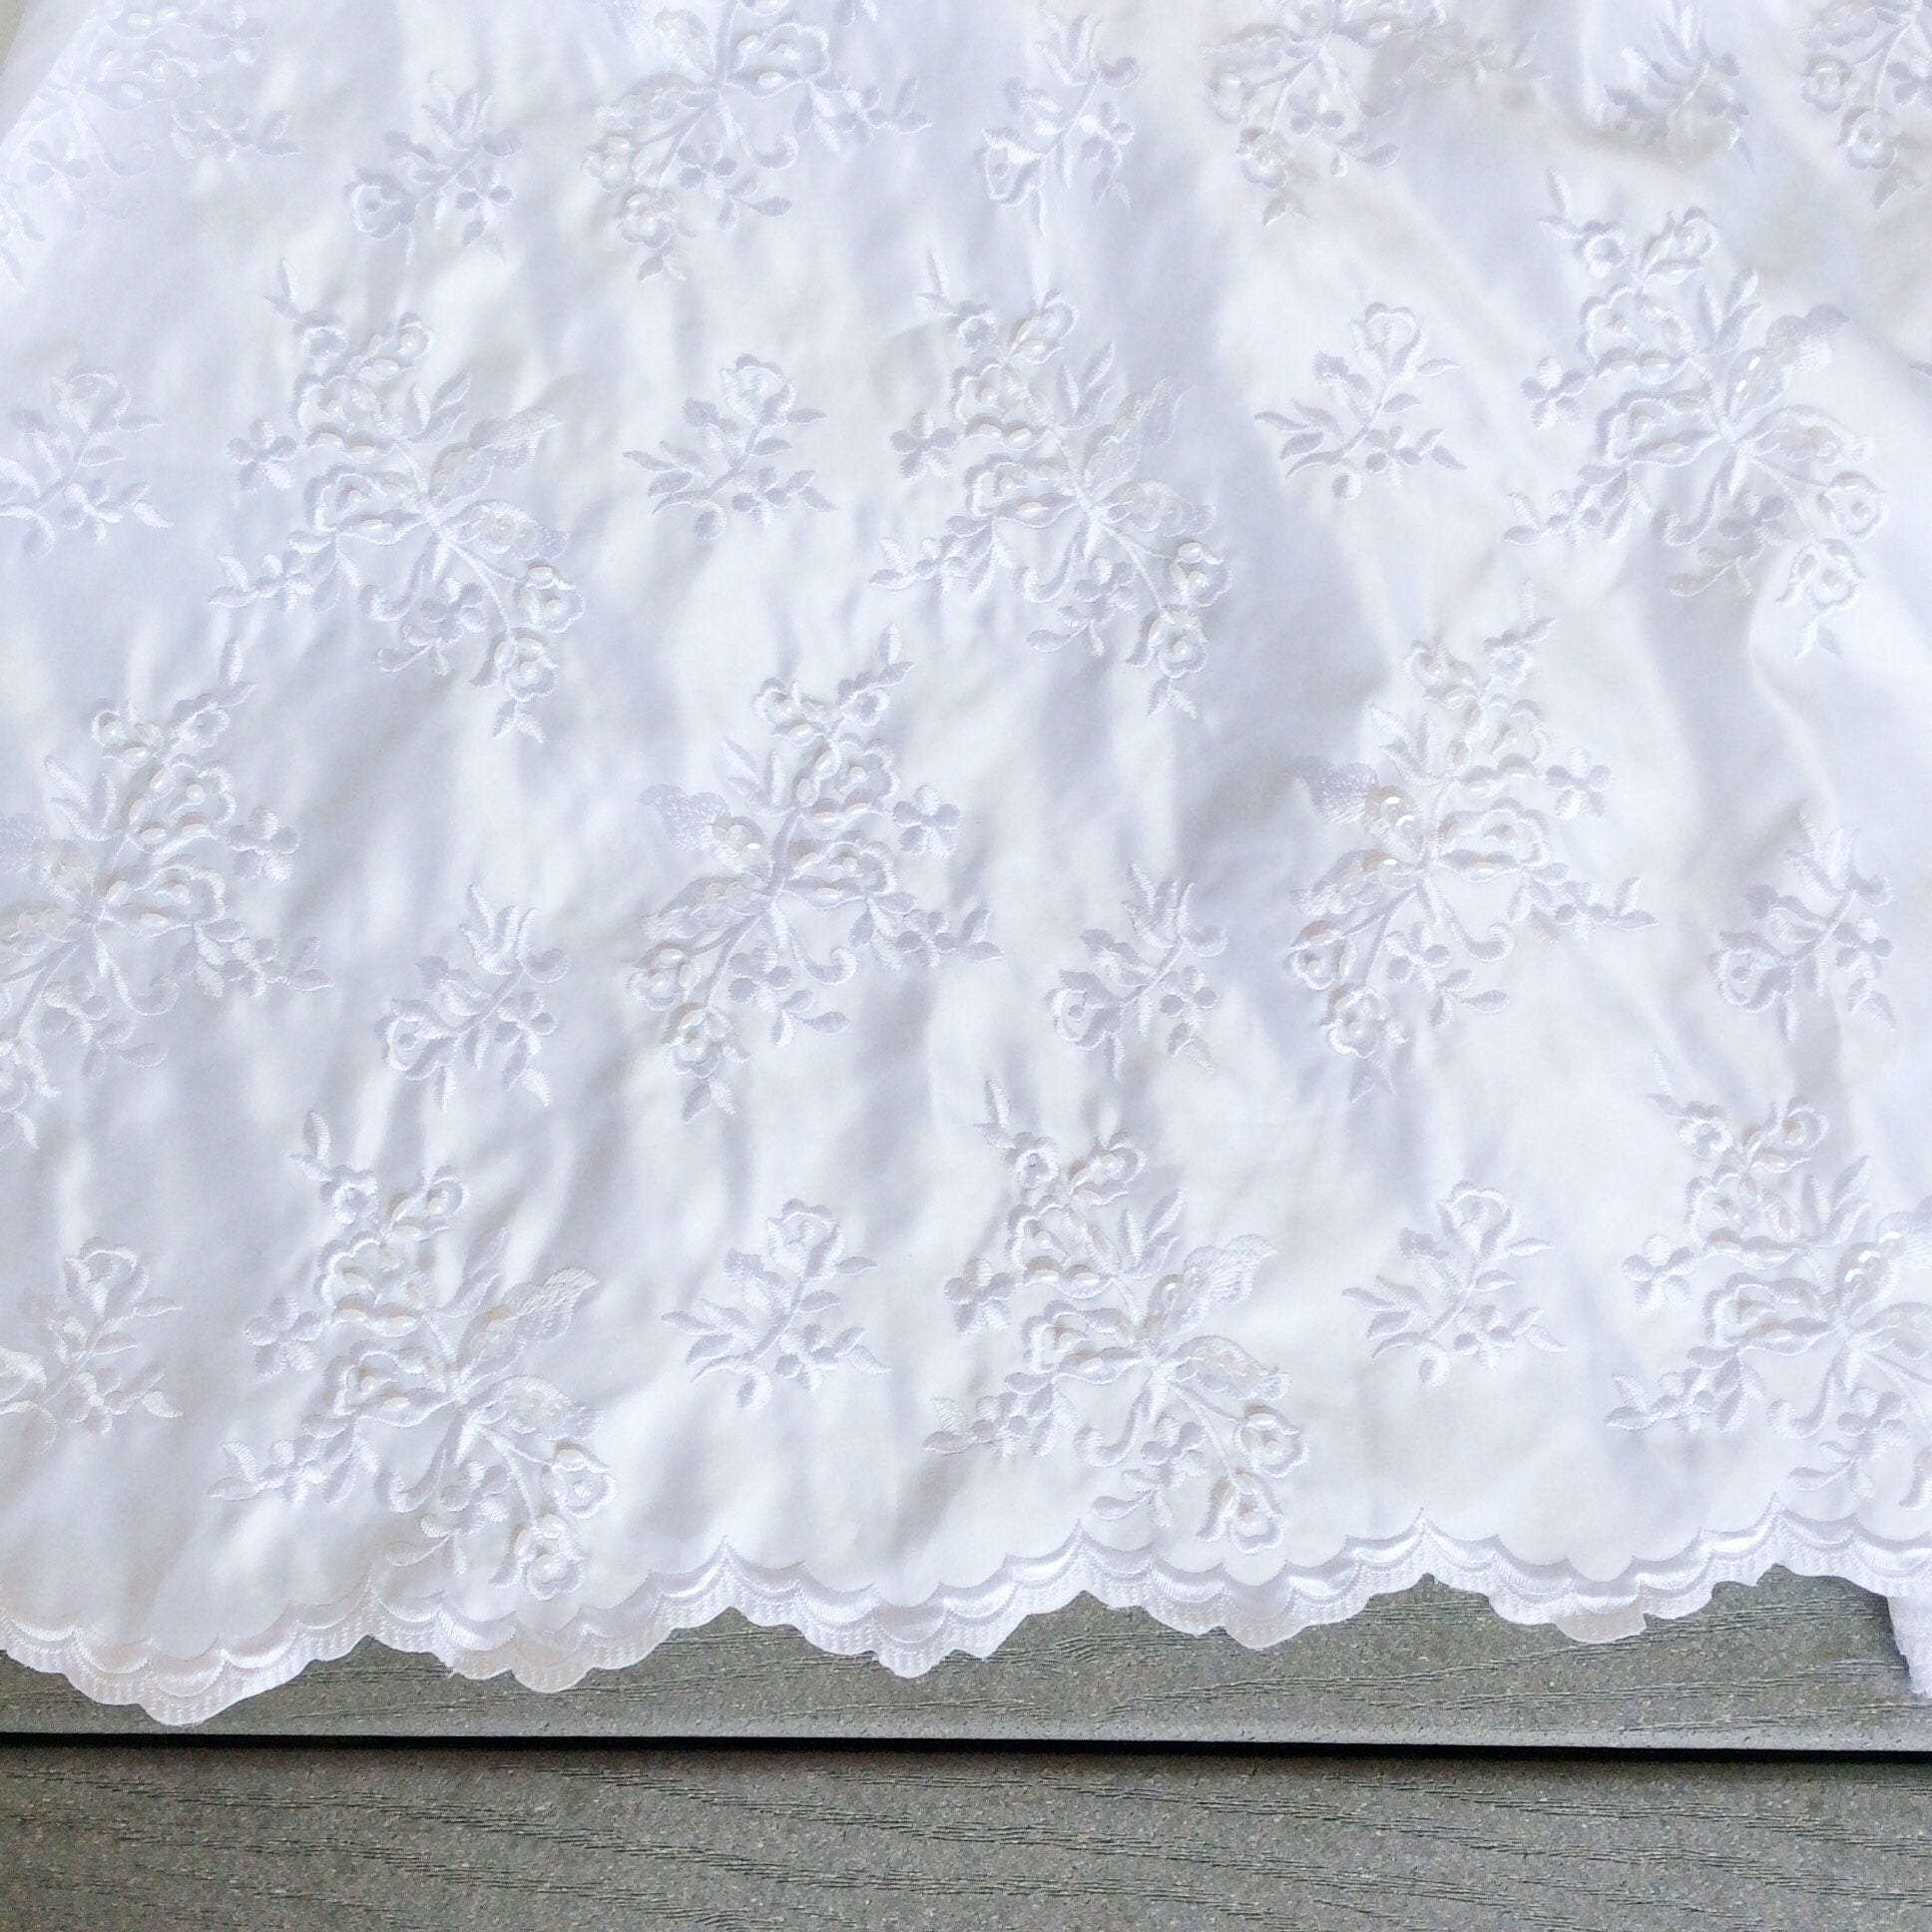 White satin wedding fabric by the yard designer lace for White lace fabric for wedding dresses